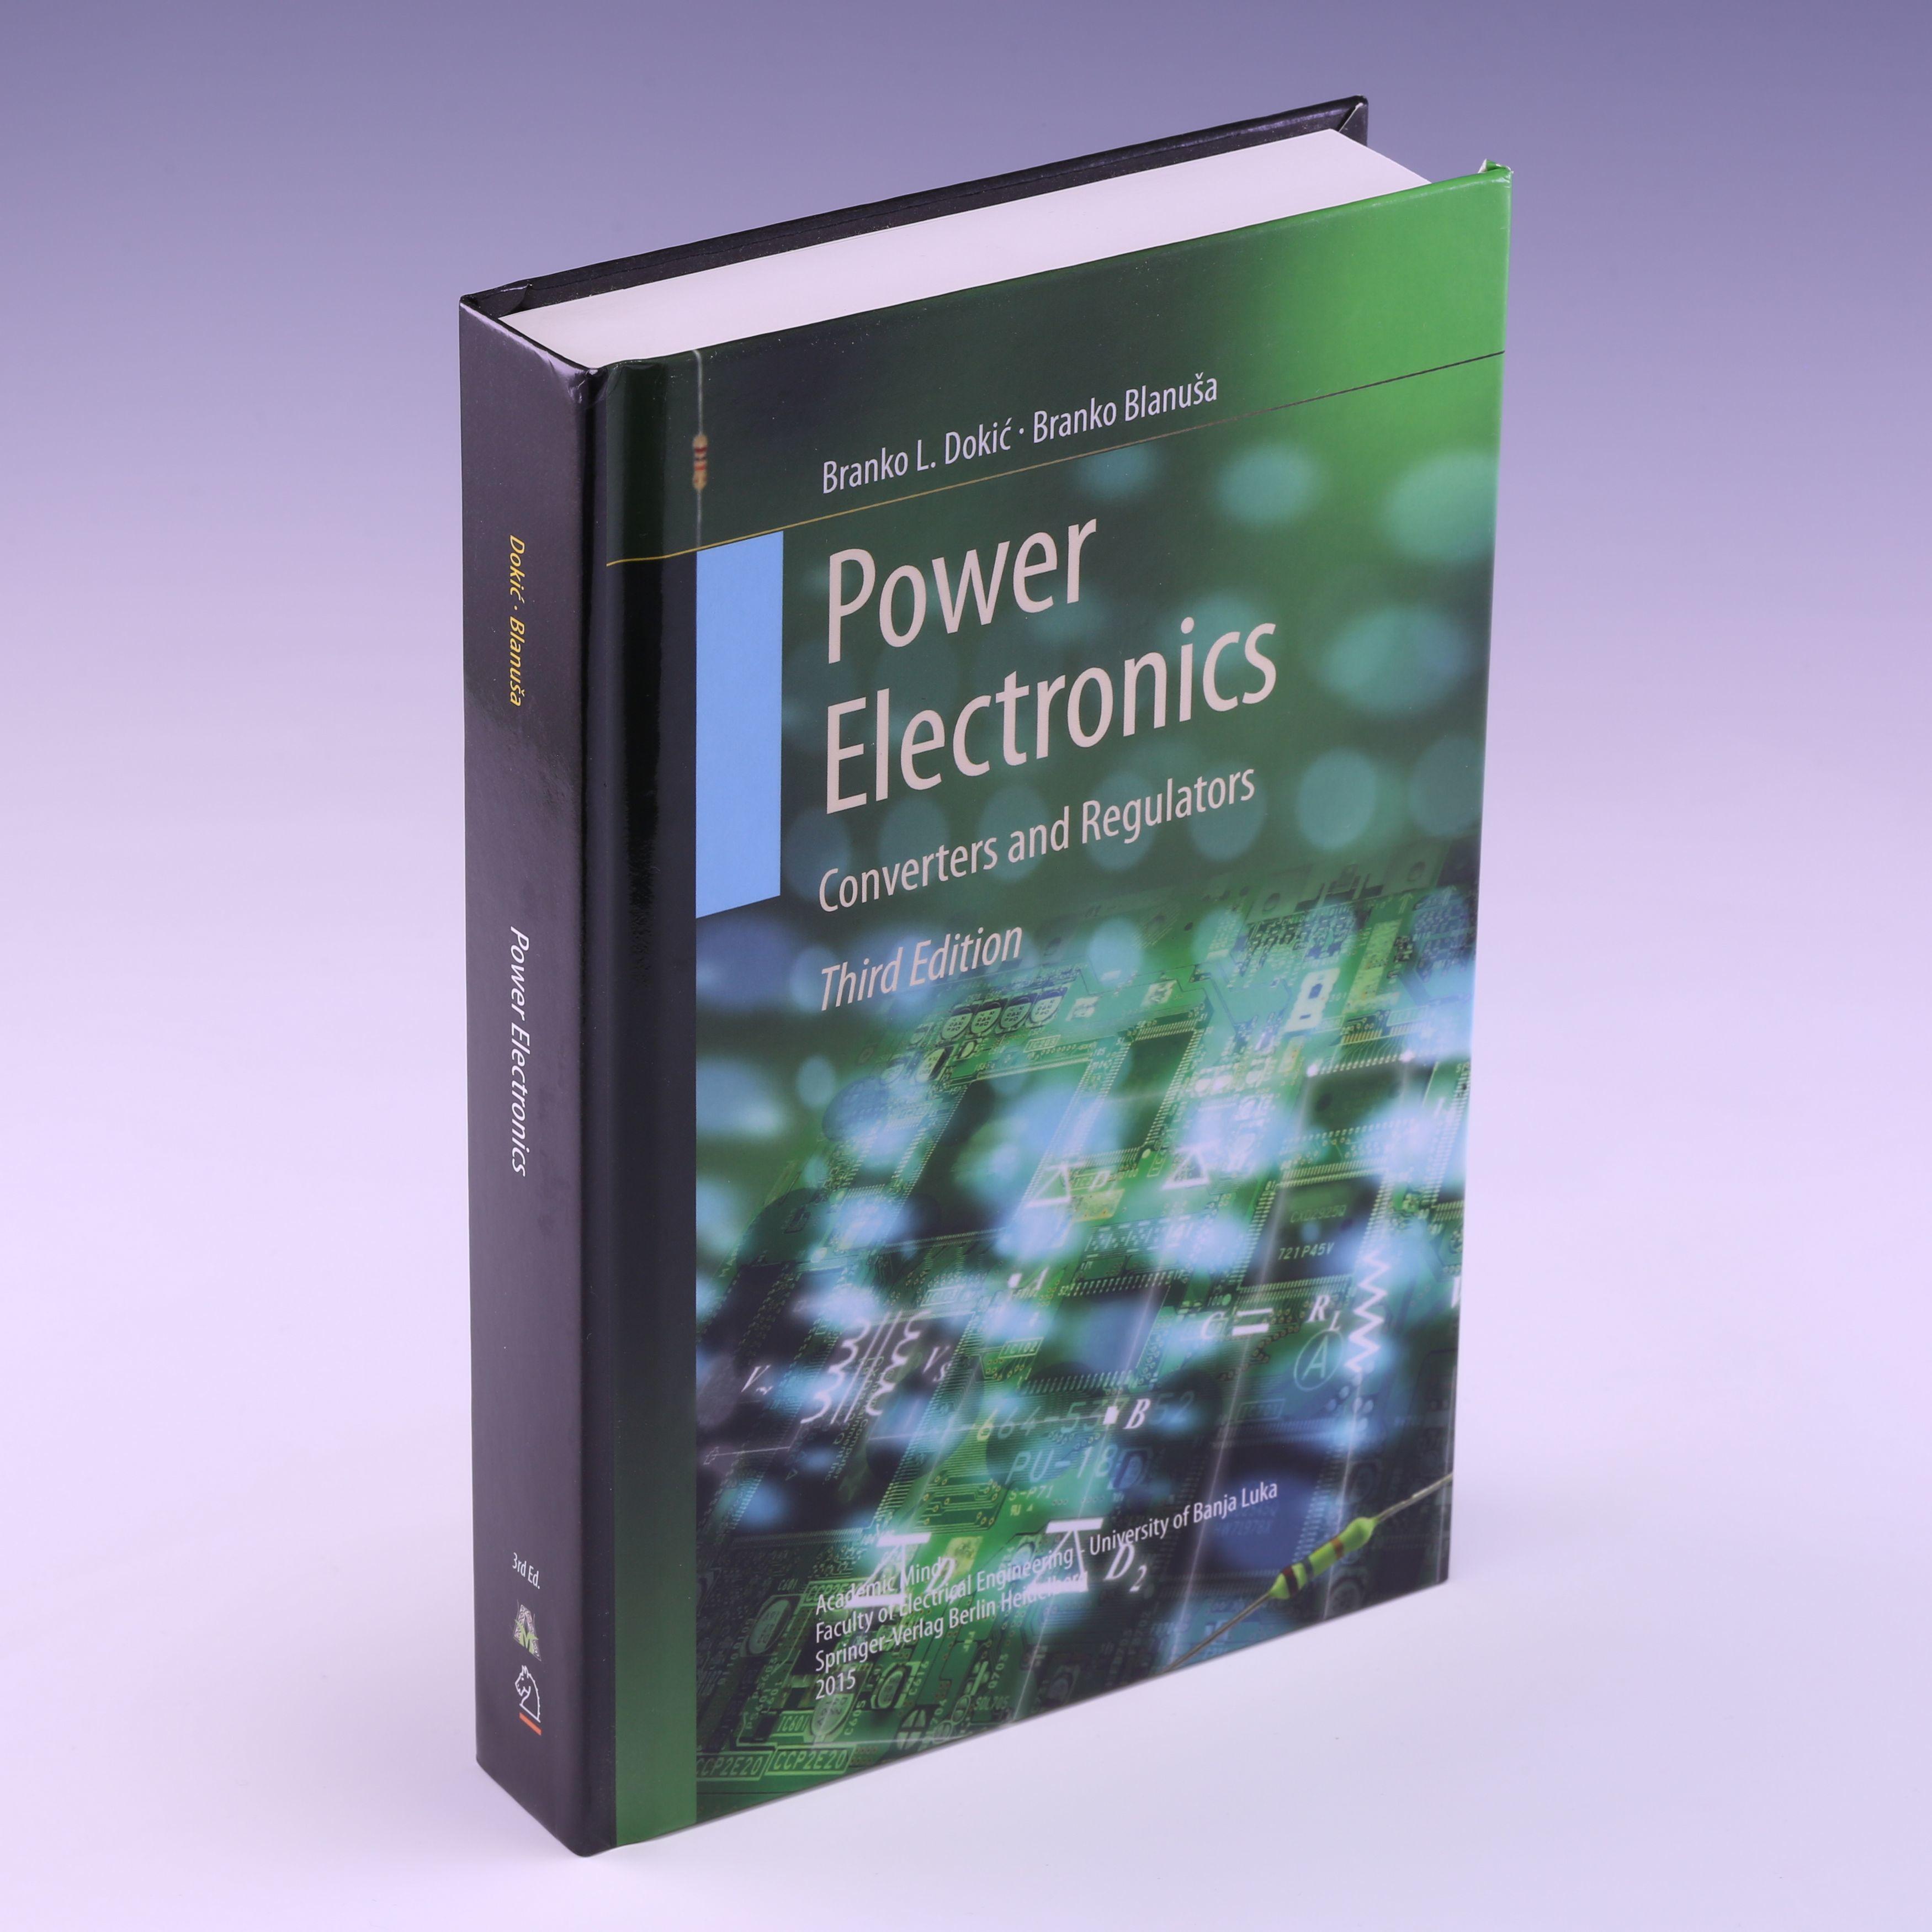 9783319094014 - POWER ELECTRONICS: CONVERTERS AND REGULATORS